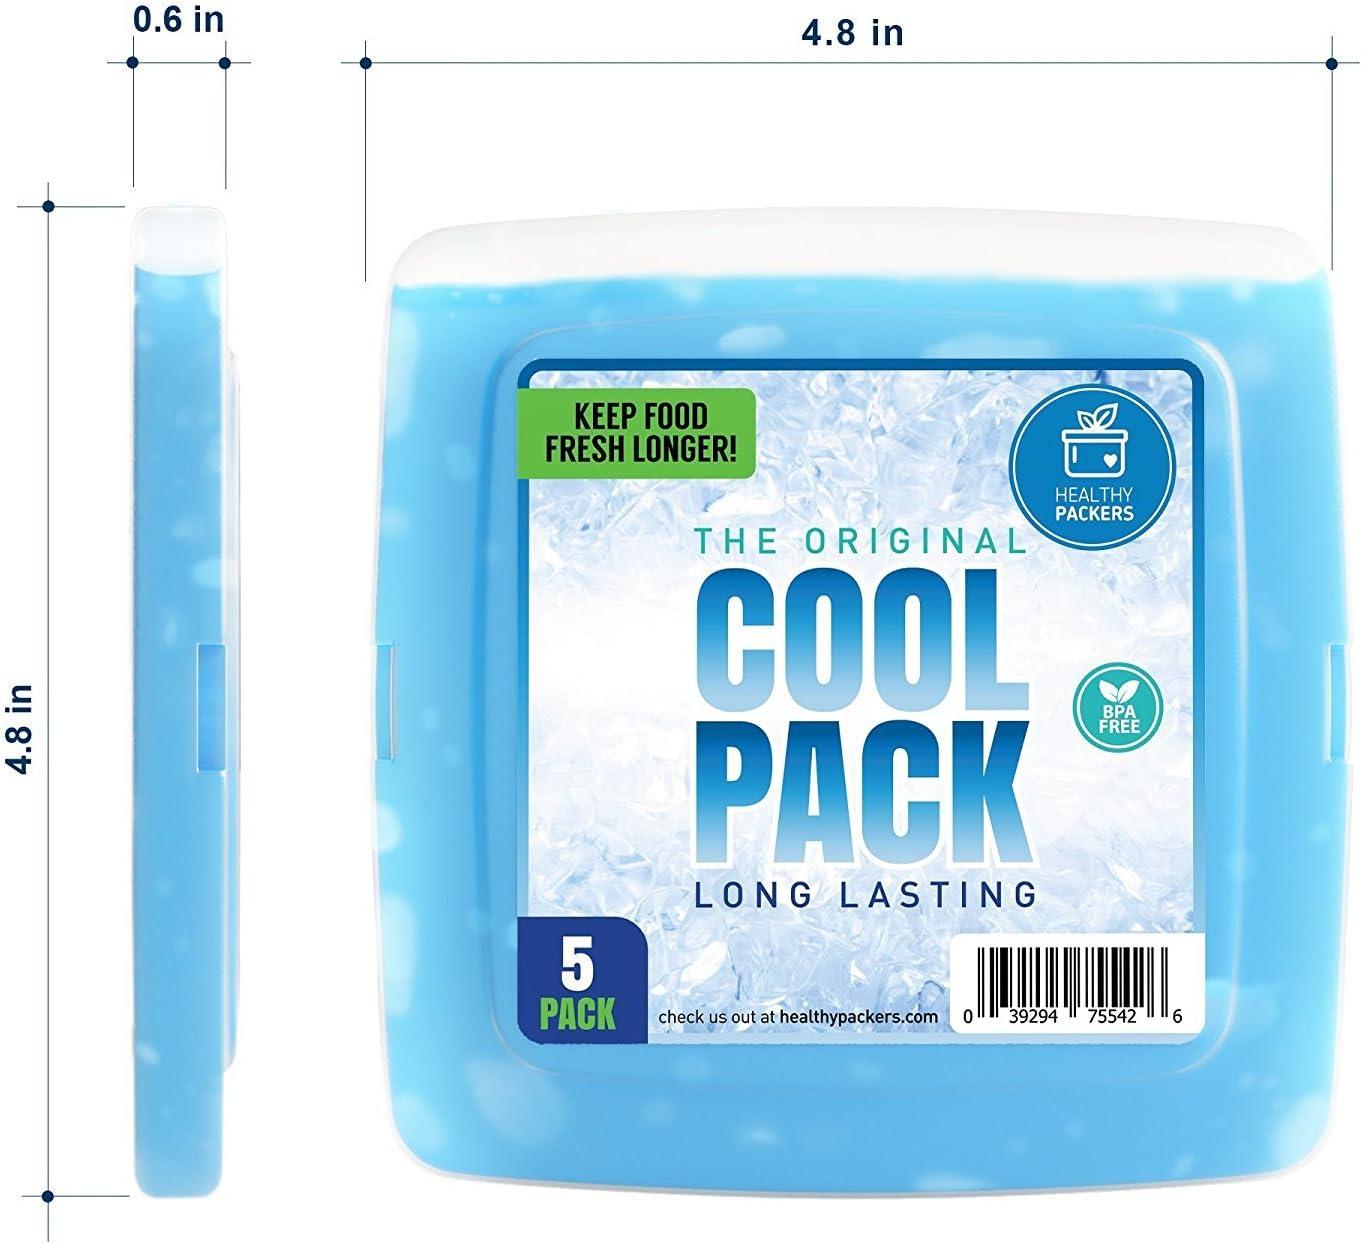 NUEVO] Cool Pack, Slim y Reutilizable Ice Pack para Fiambrera Caja ...